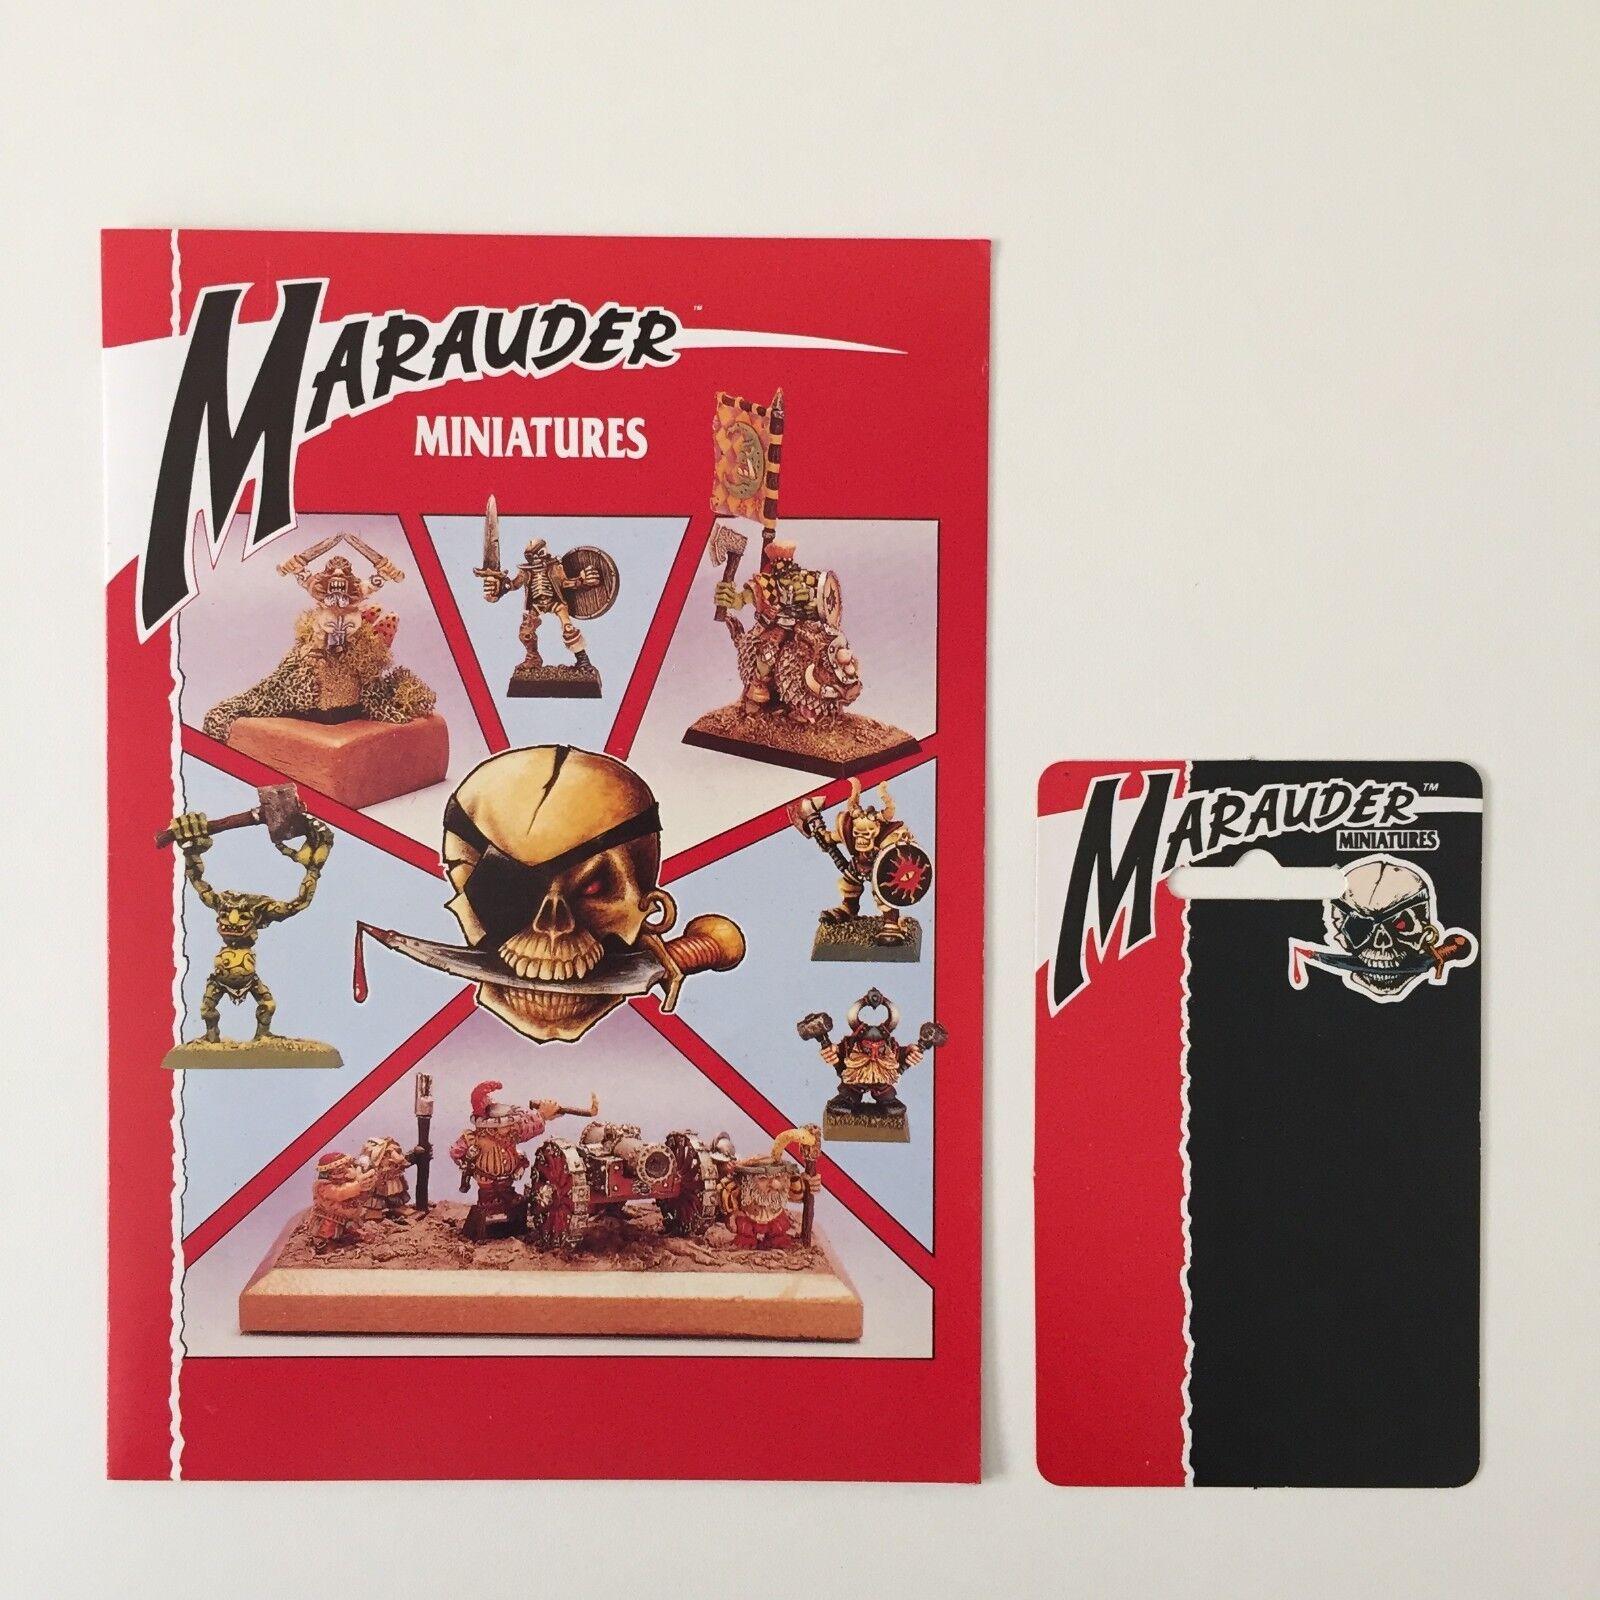 MARAUDER MINIATURES CHRISTMAS CARD SIGNED TRISH & ALY MORRISON AUTOGRAPH (1989)